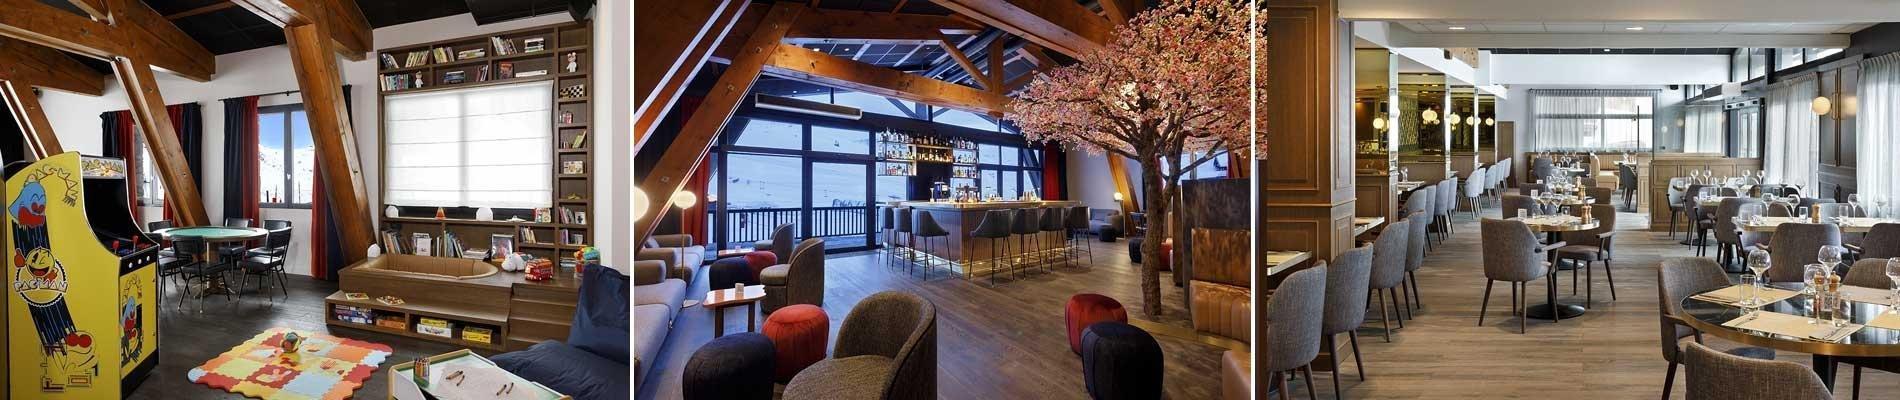 hotel marielle val thorens assas ski wintersport